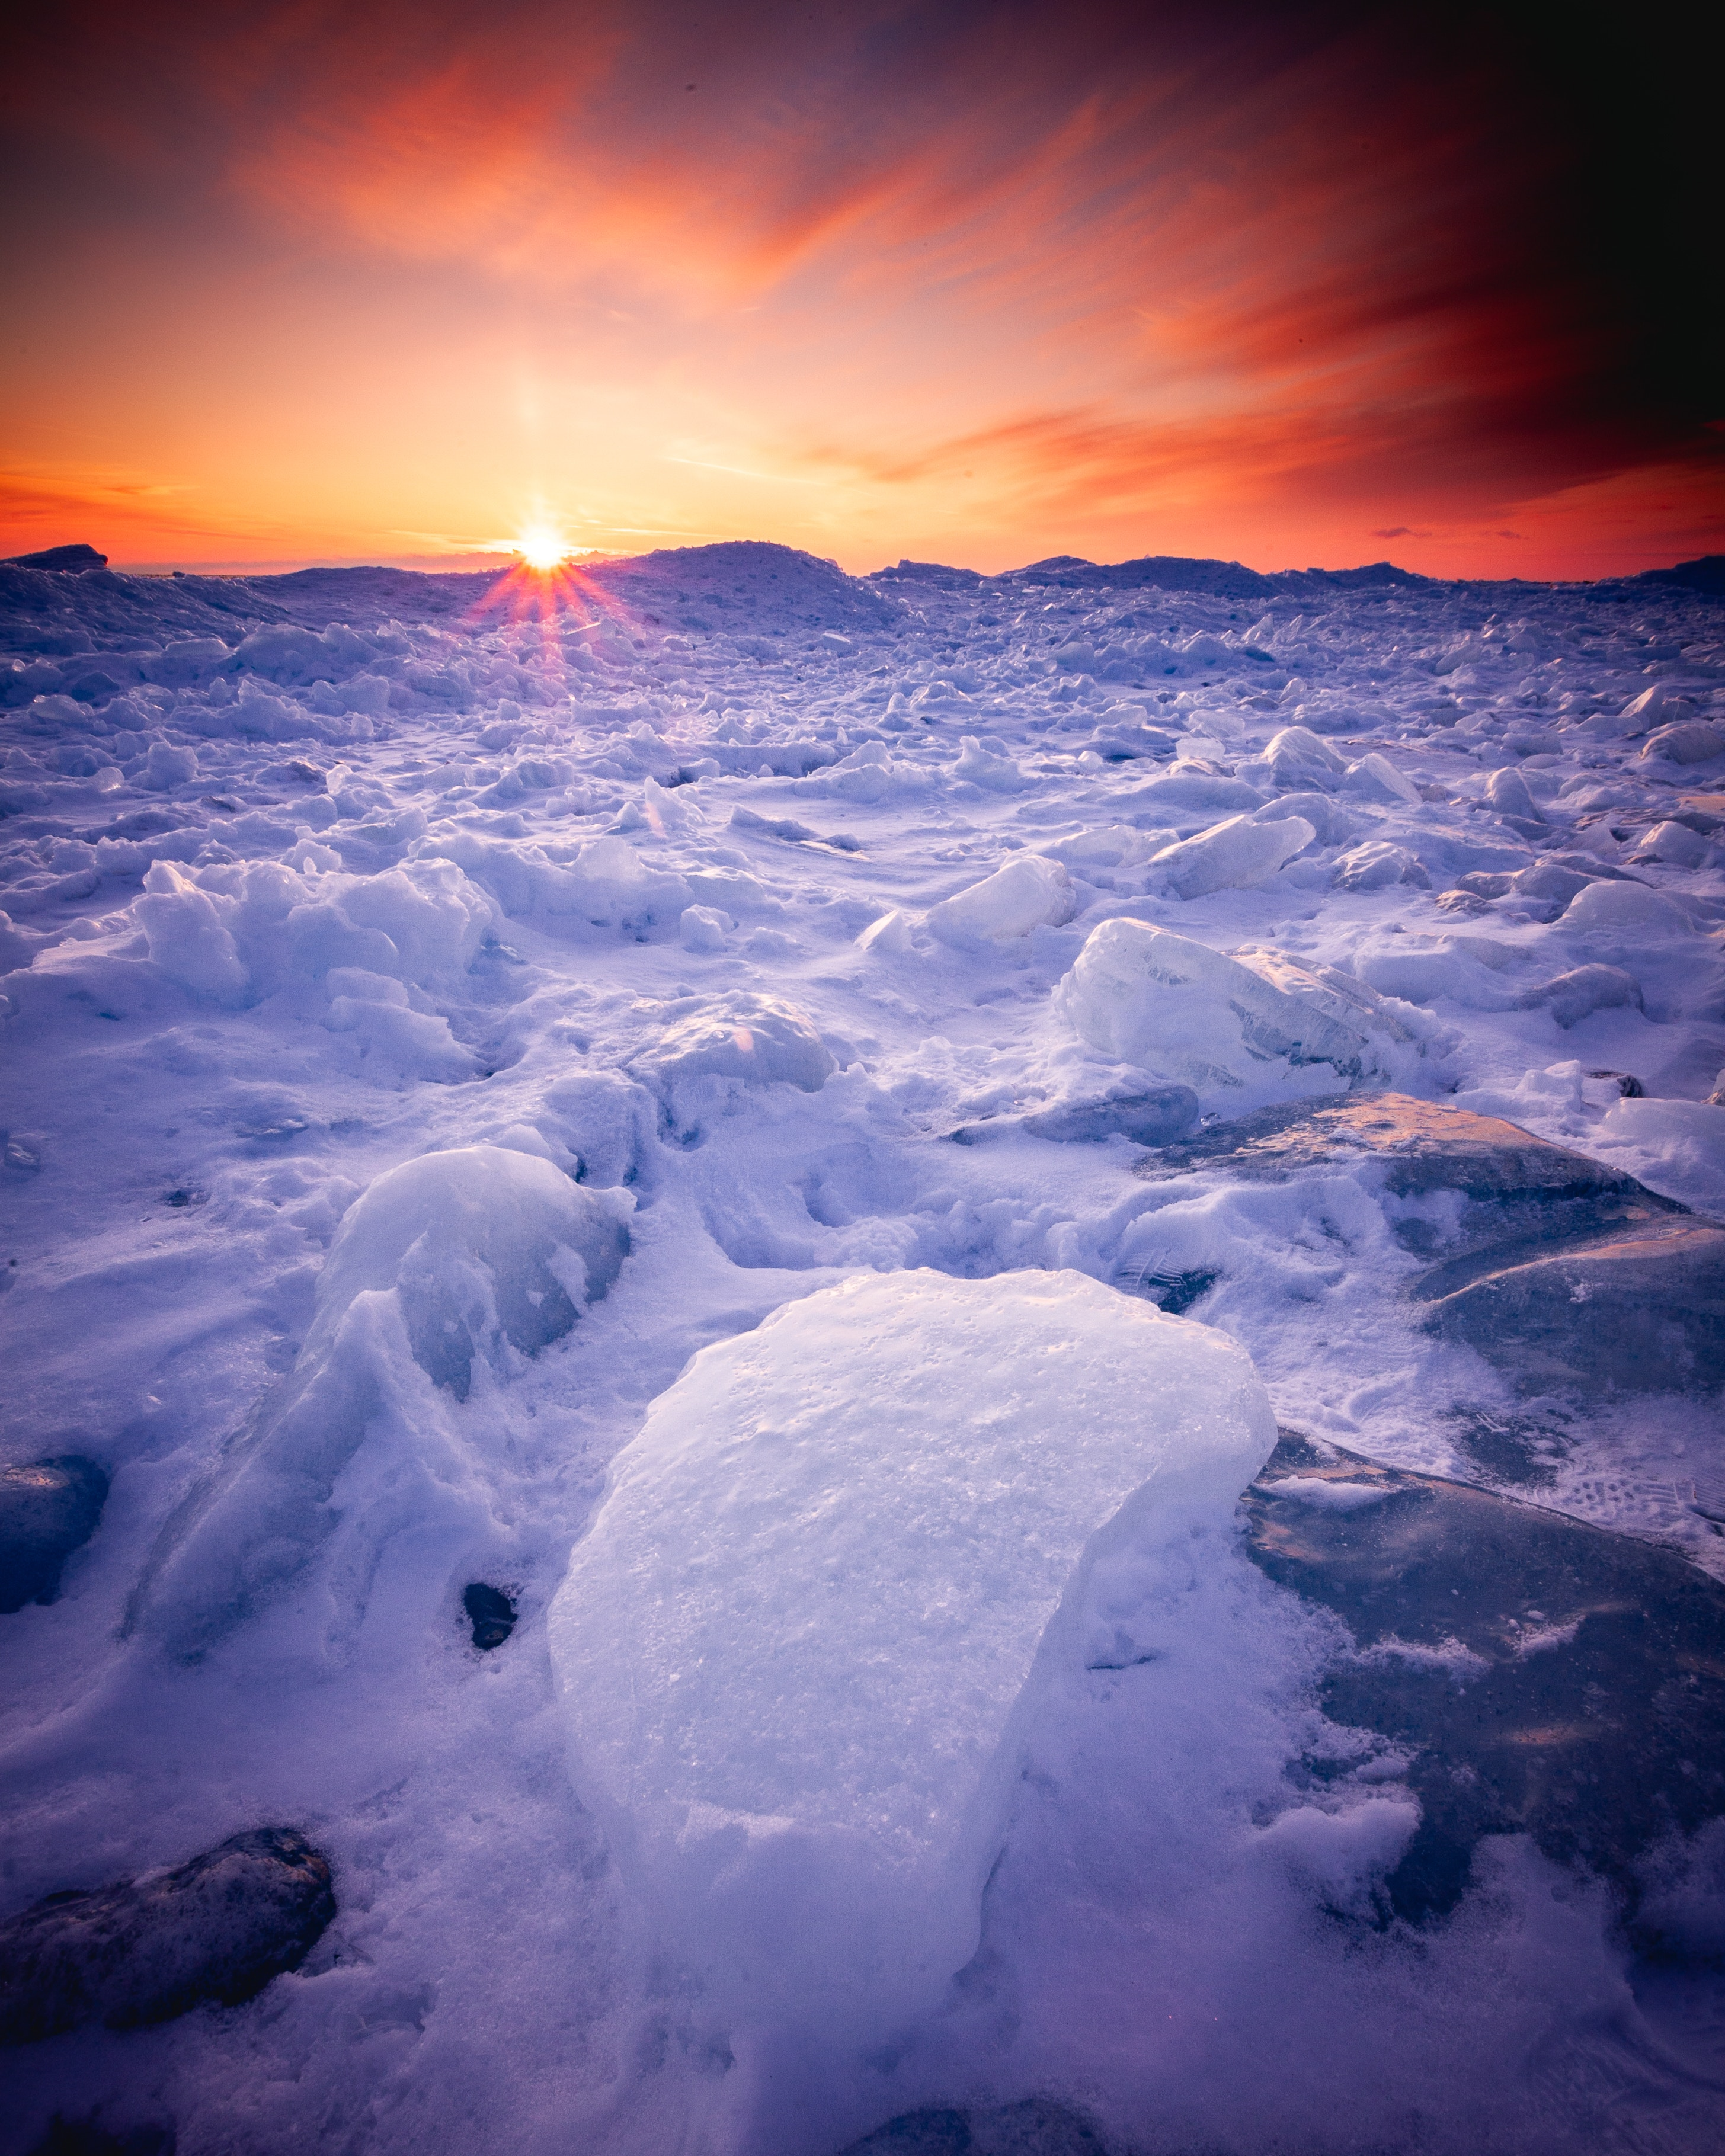 55364 Заставки и Обои Зима на телефон. Скачать Природа, Снег, Зима, Закат, Горизонт, Лед картинки бесплатно